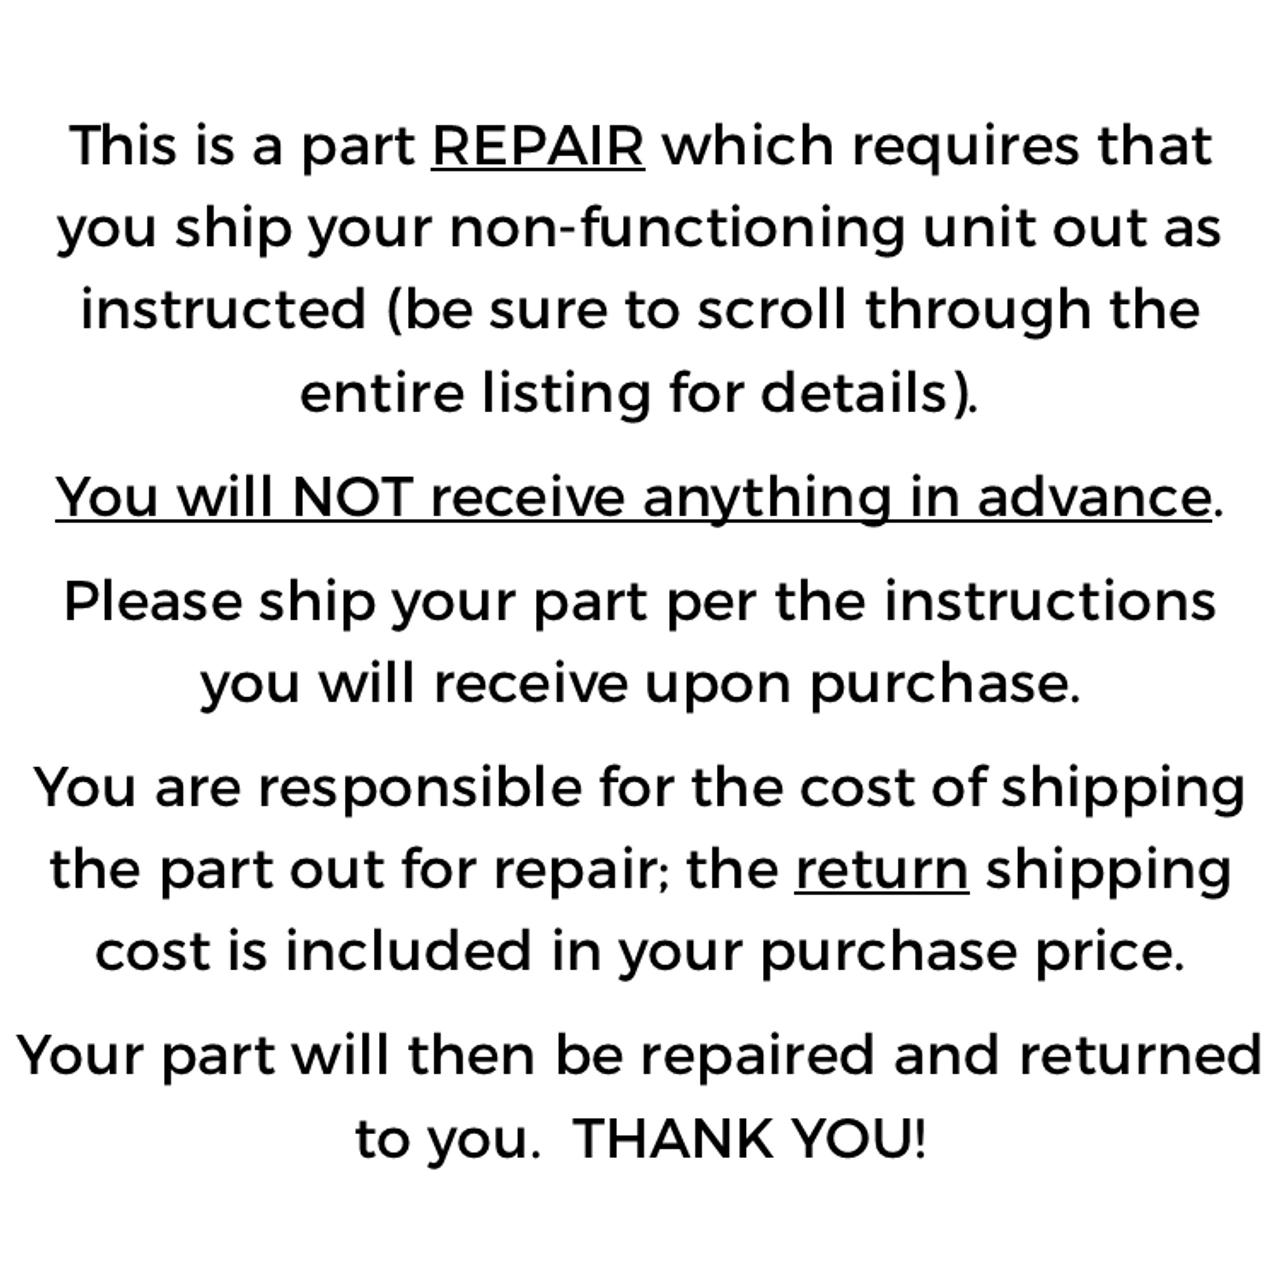 Leviton Colortran ENR Universal Control Module 600-904 240V, repair